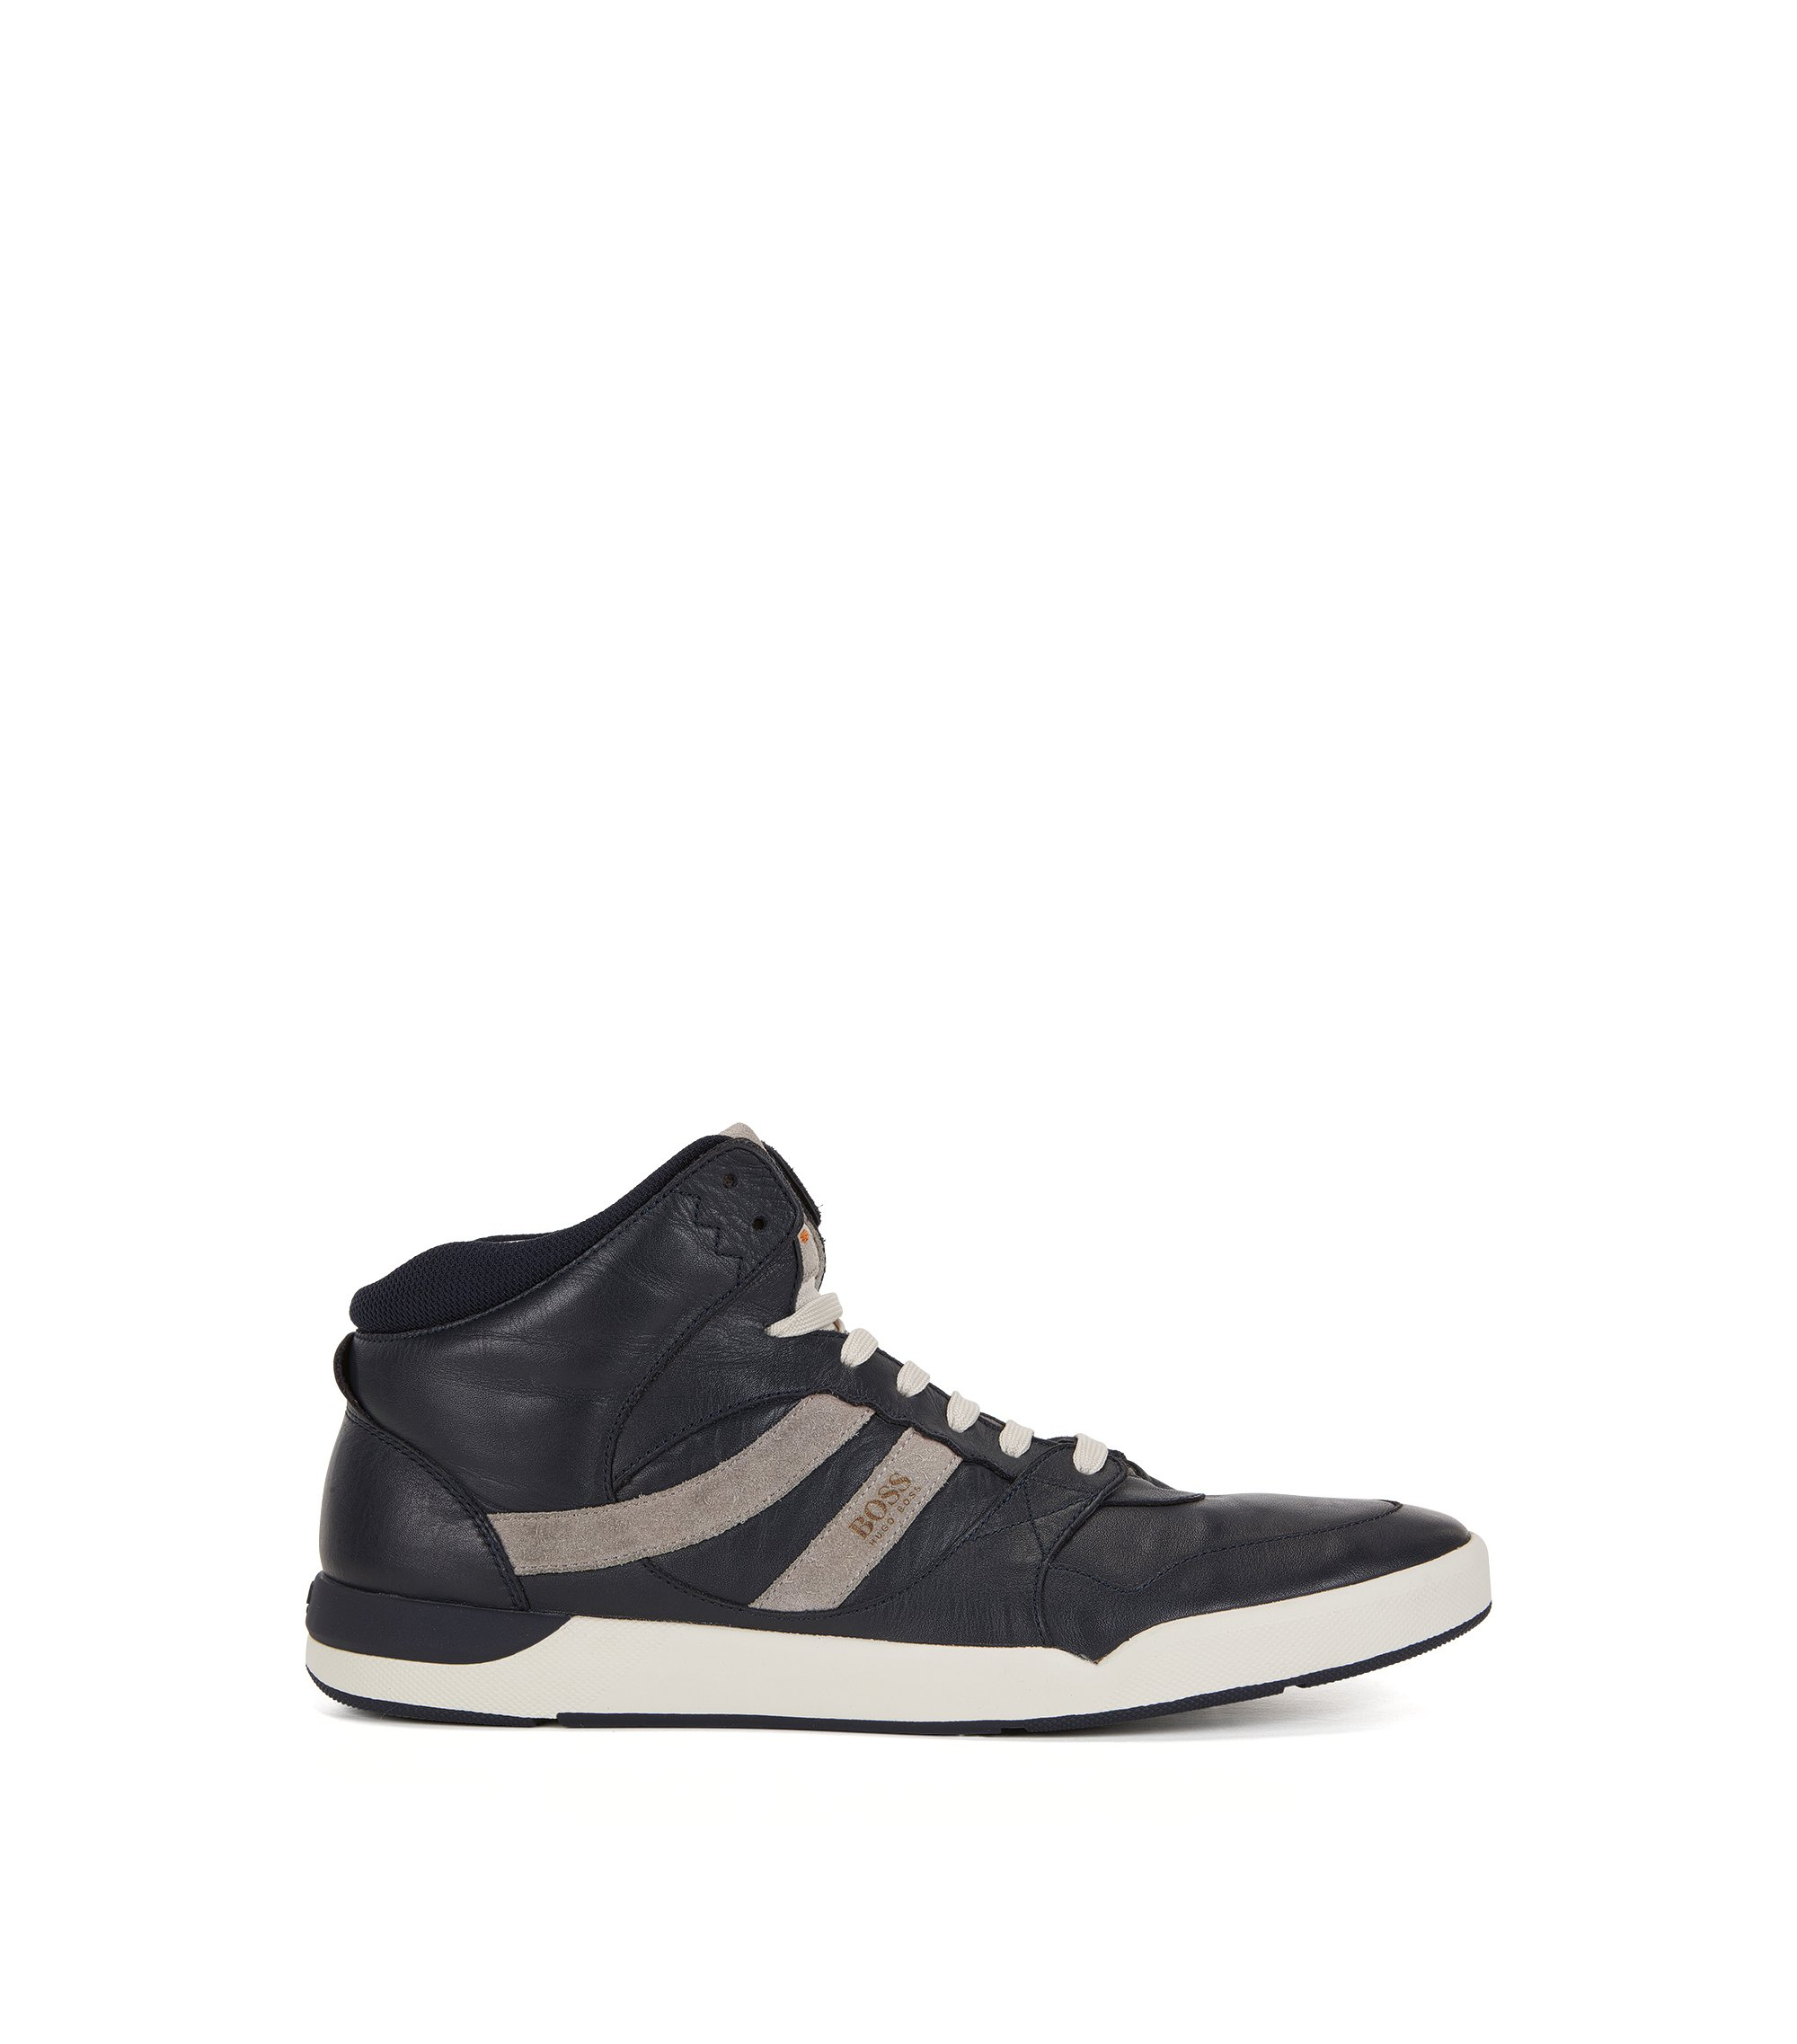 Hightop Sneakers aus gewaschenem Leder, Dunkelblau